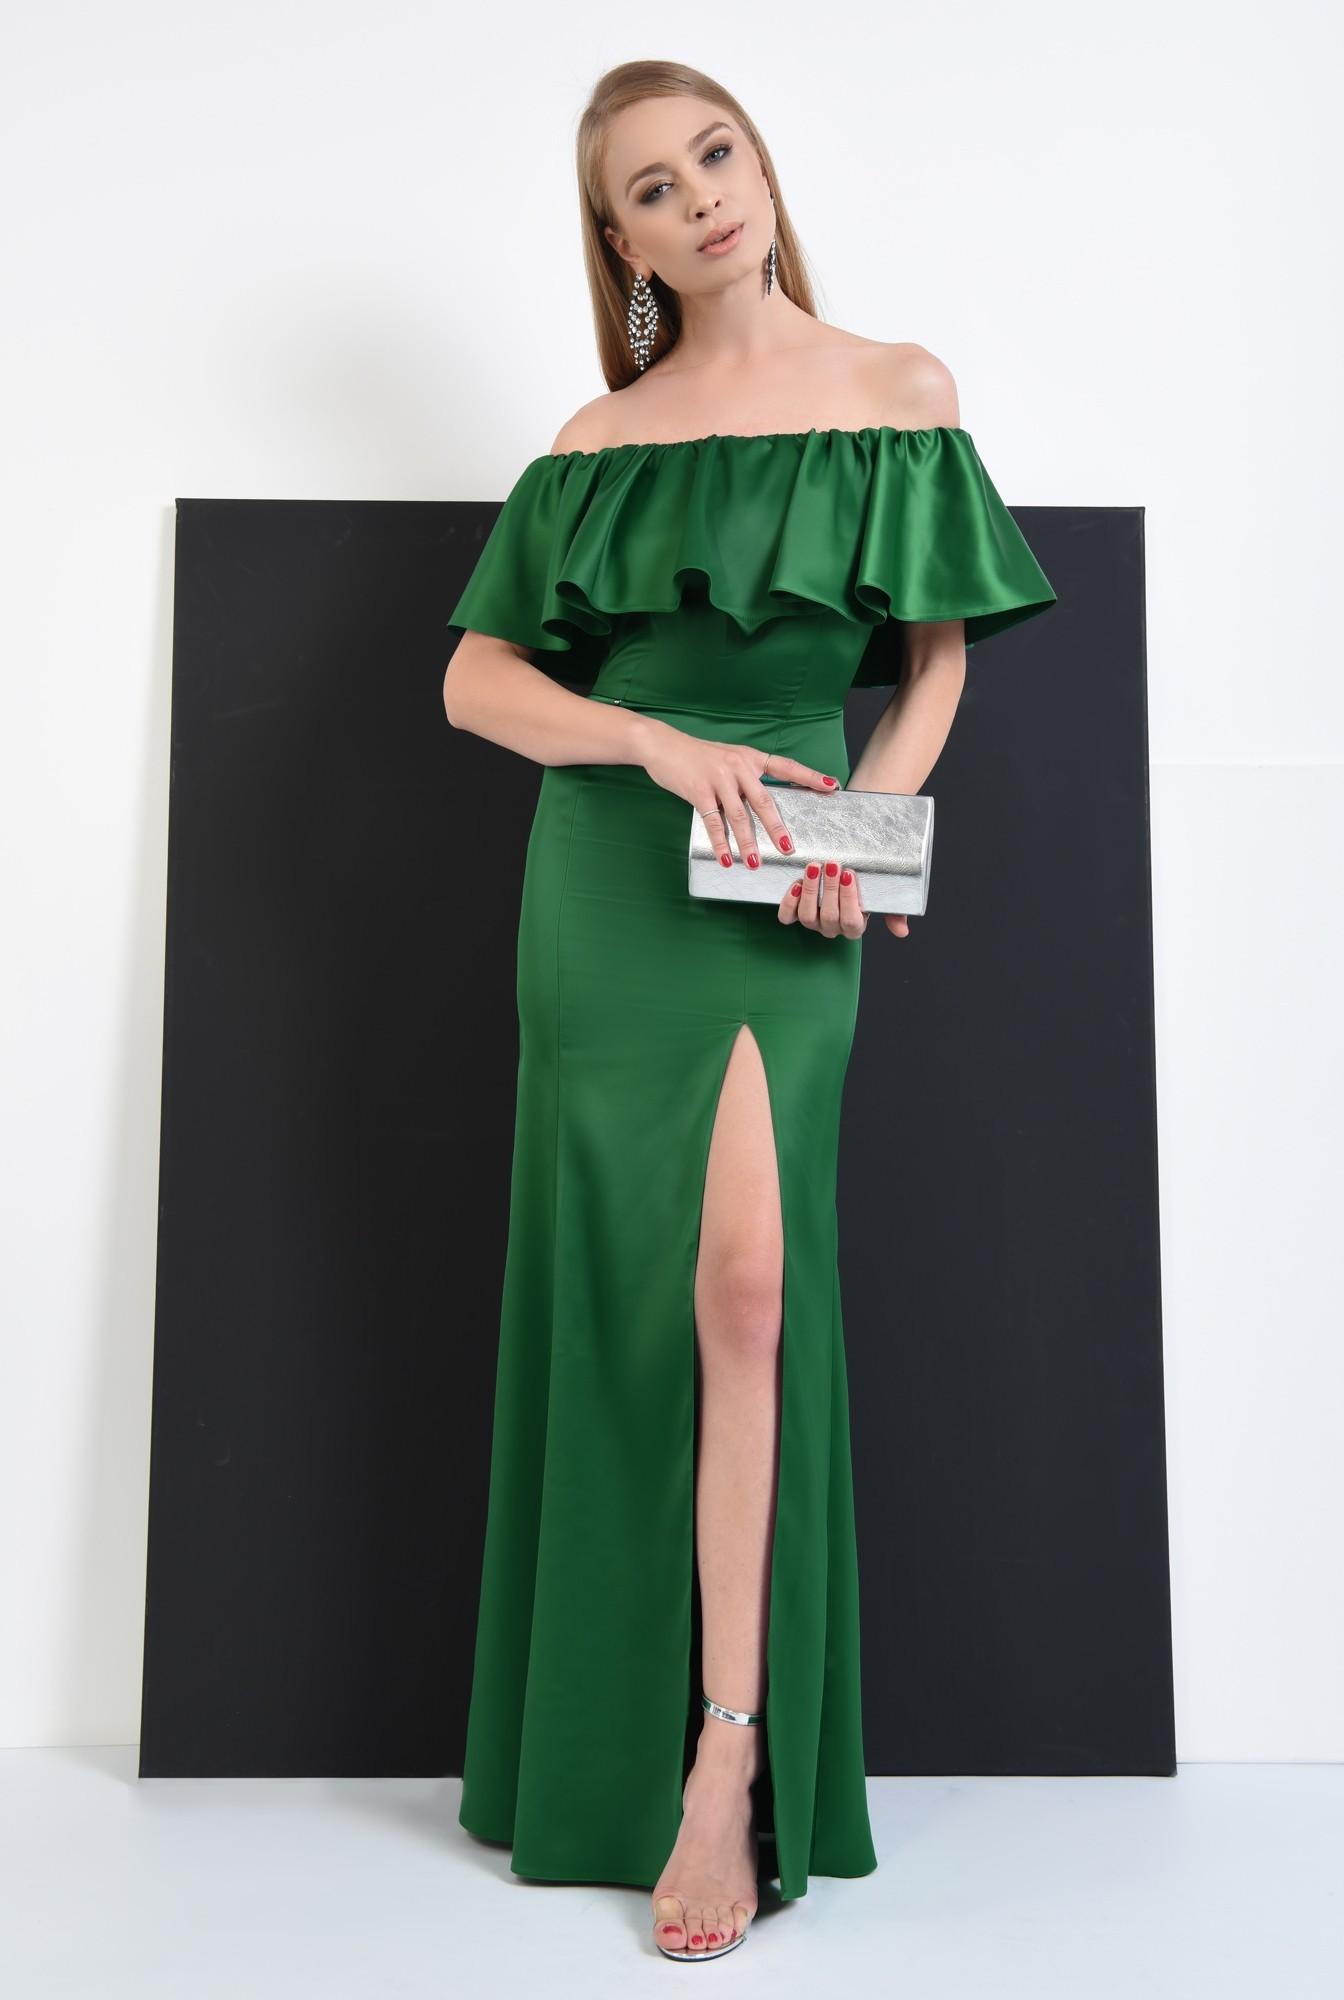 2 - rochie de seara smarald, slit adanc, umeri dezgoliti, maxi